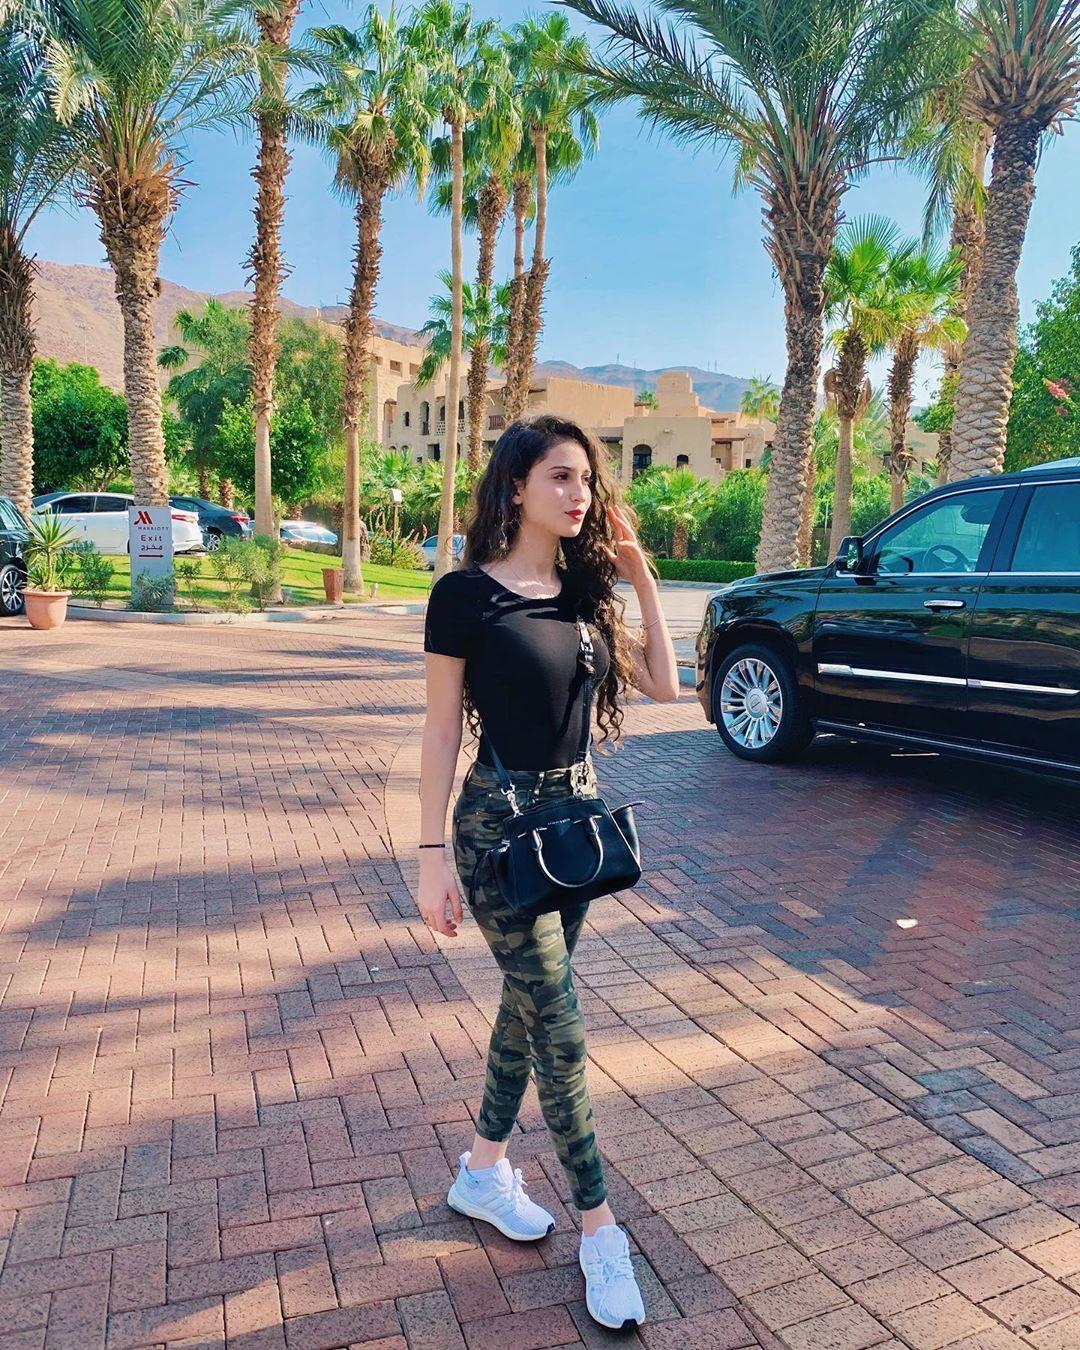 Lifeassara لايـف آز ســارة On Instagram والله كانت طشة جميلة أنا ليش روحت Printed Tunic Dress Selling Clothes Clothes